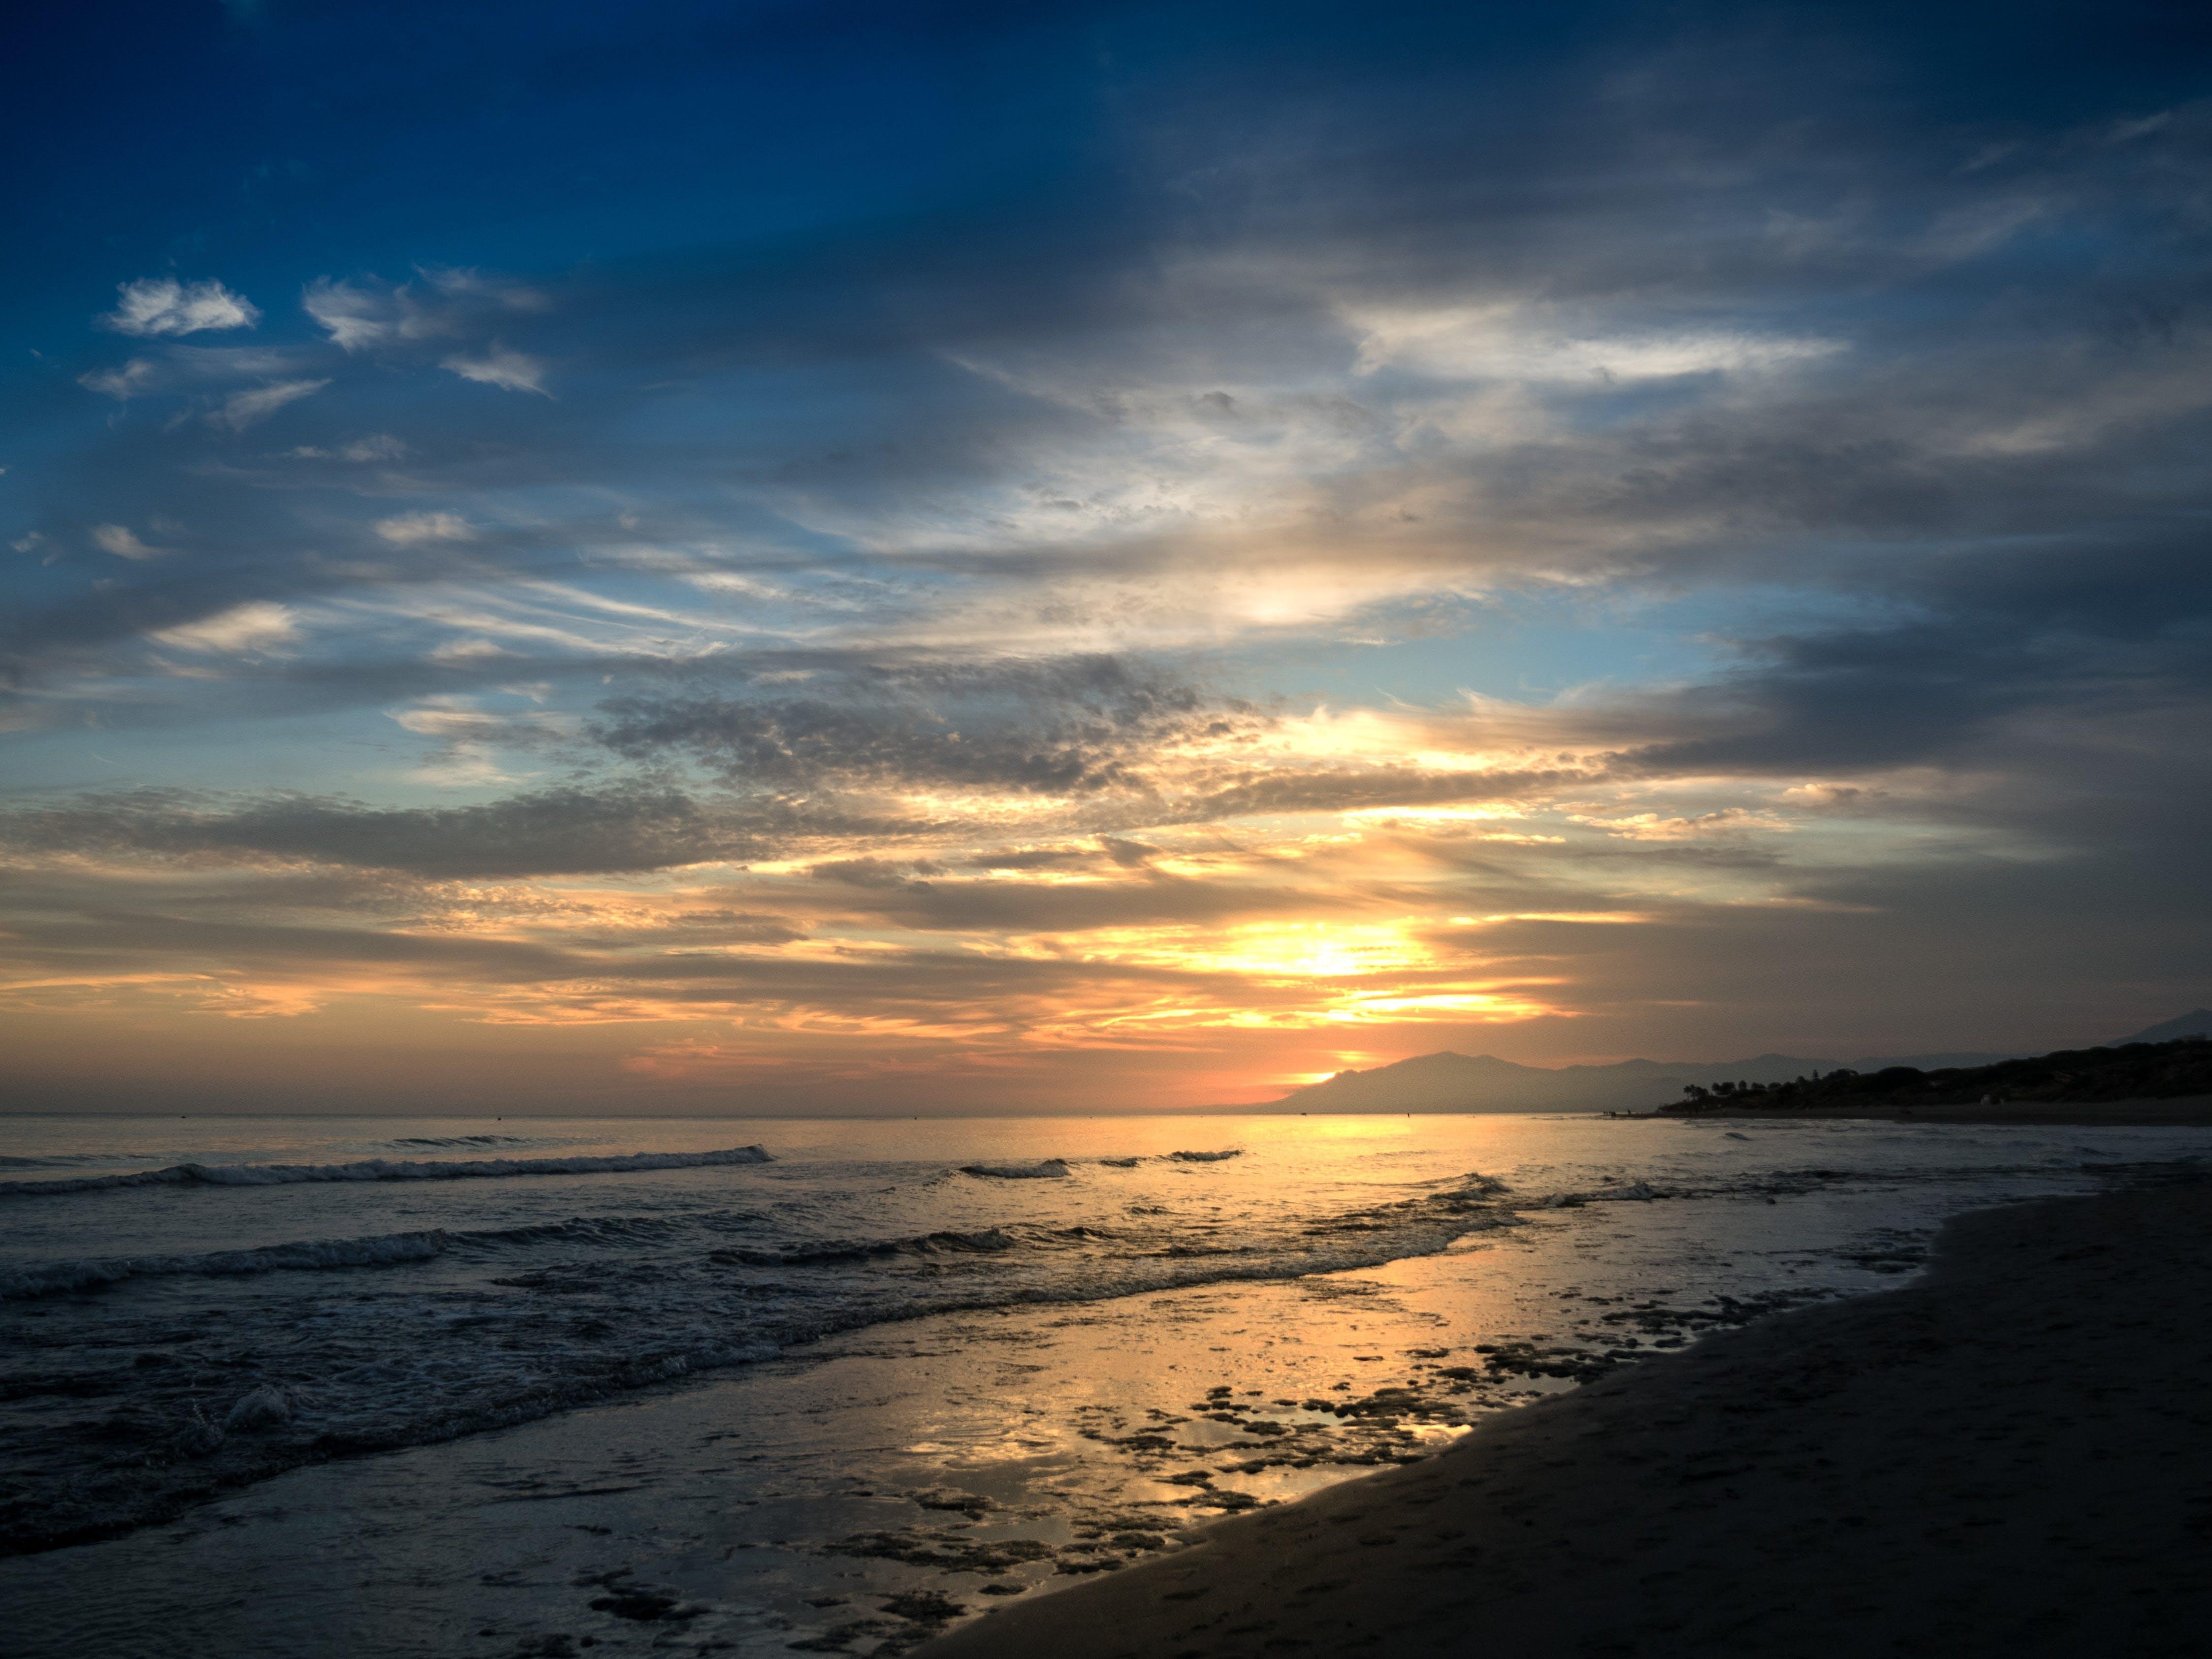 White Sand Beach during Golden Hour